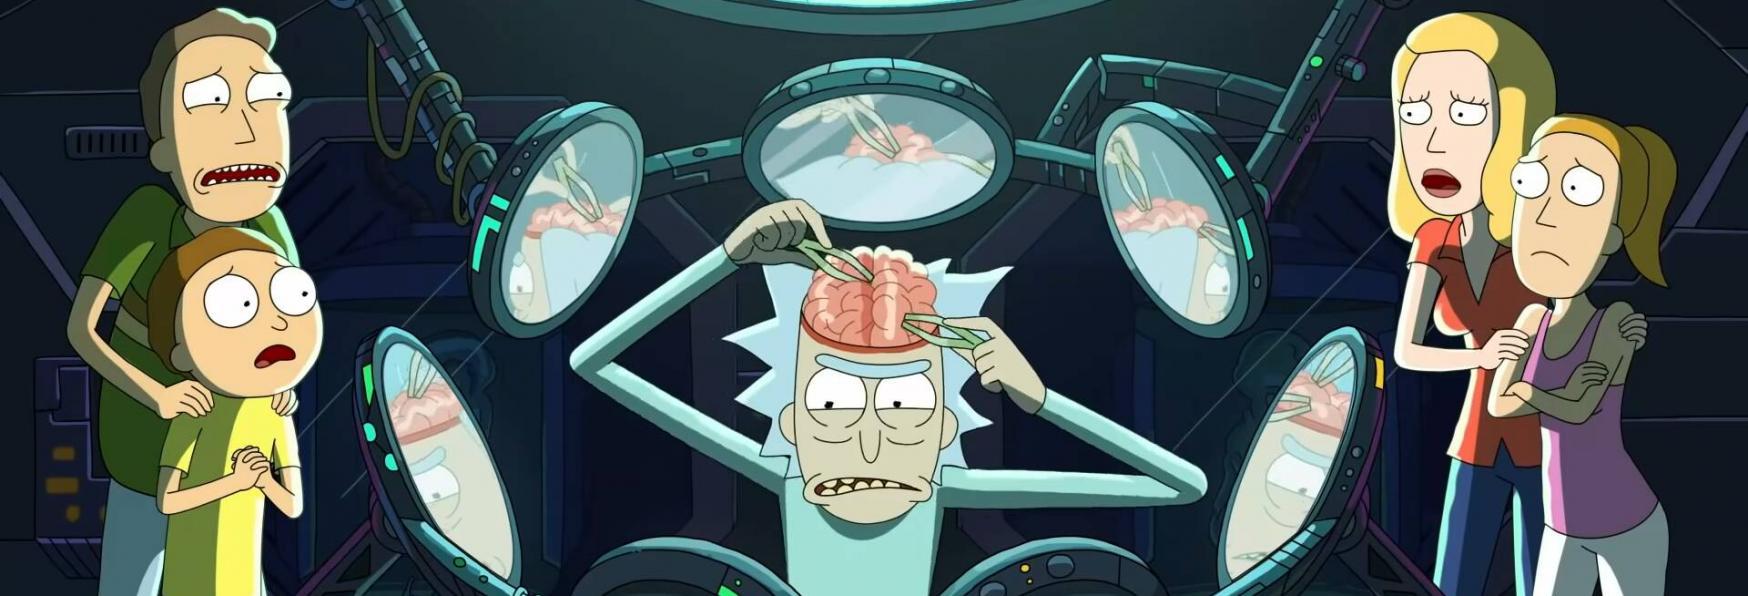 Rick and Morty 5: Christopher Lloyd nei panni di Rick nel nuovo Promo Live-Action